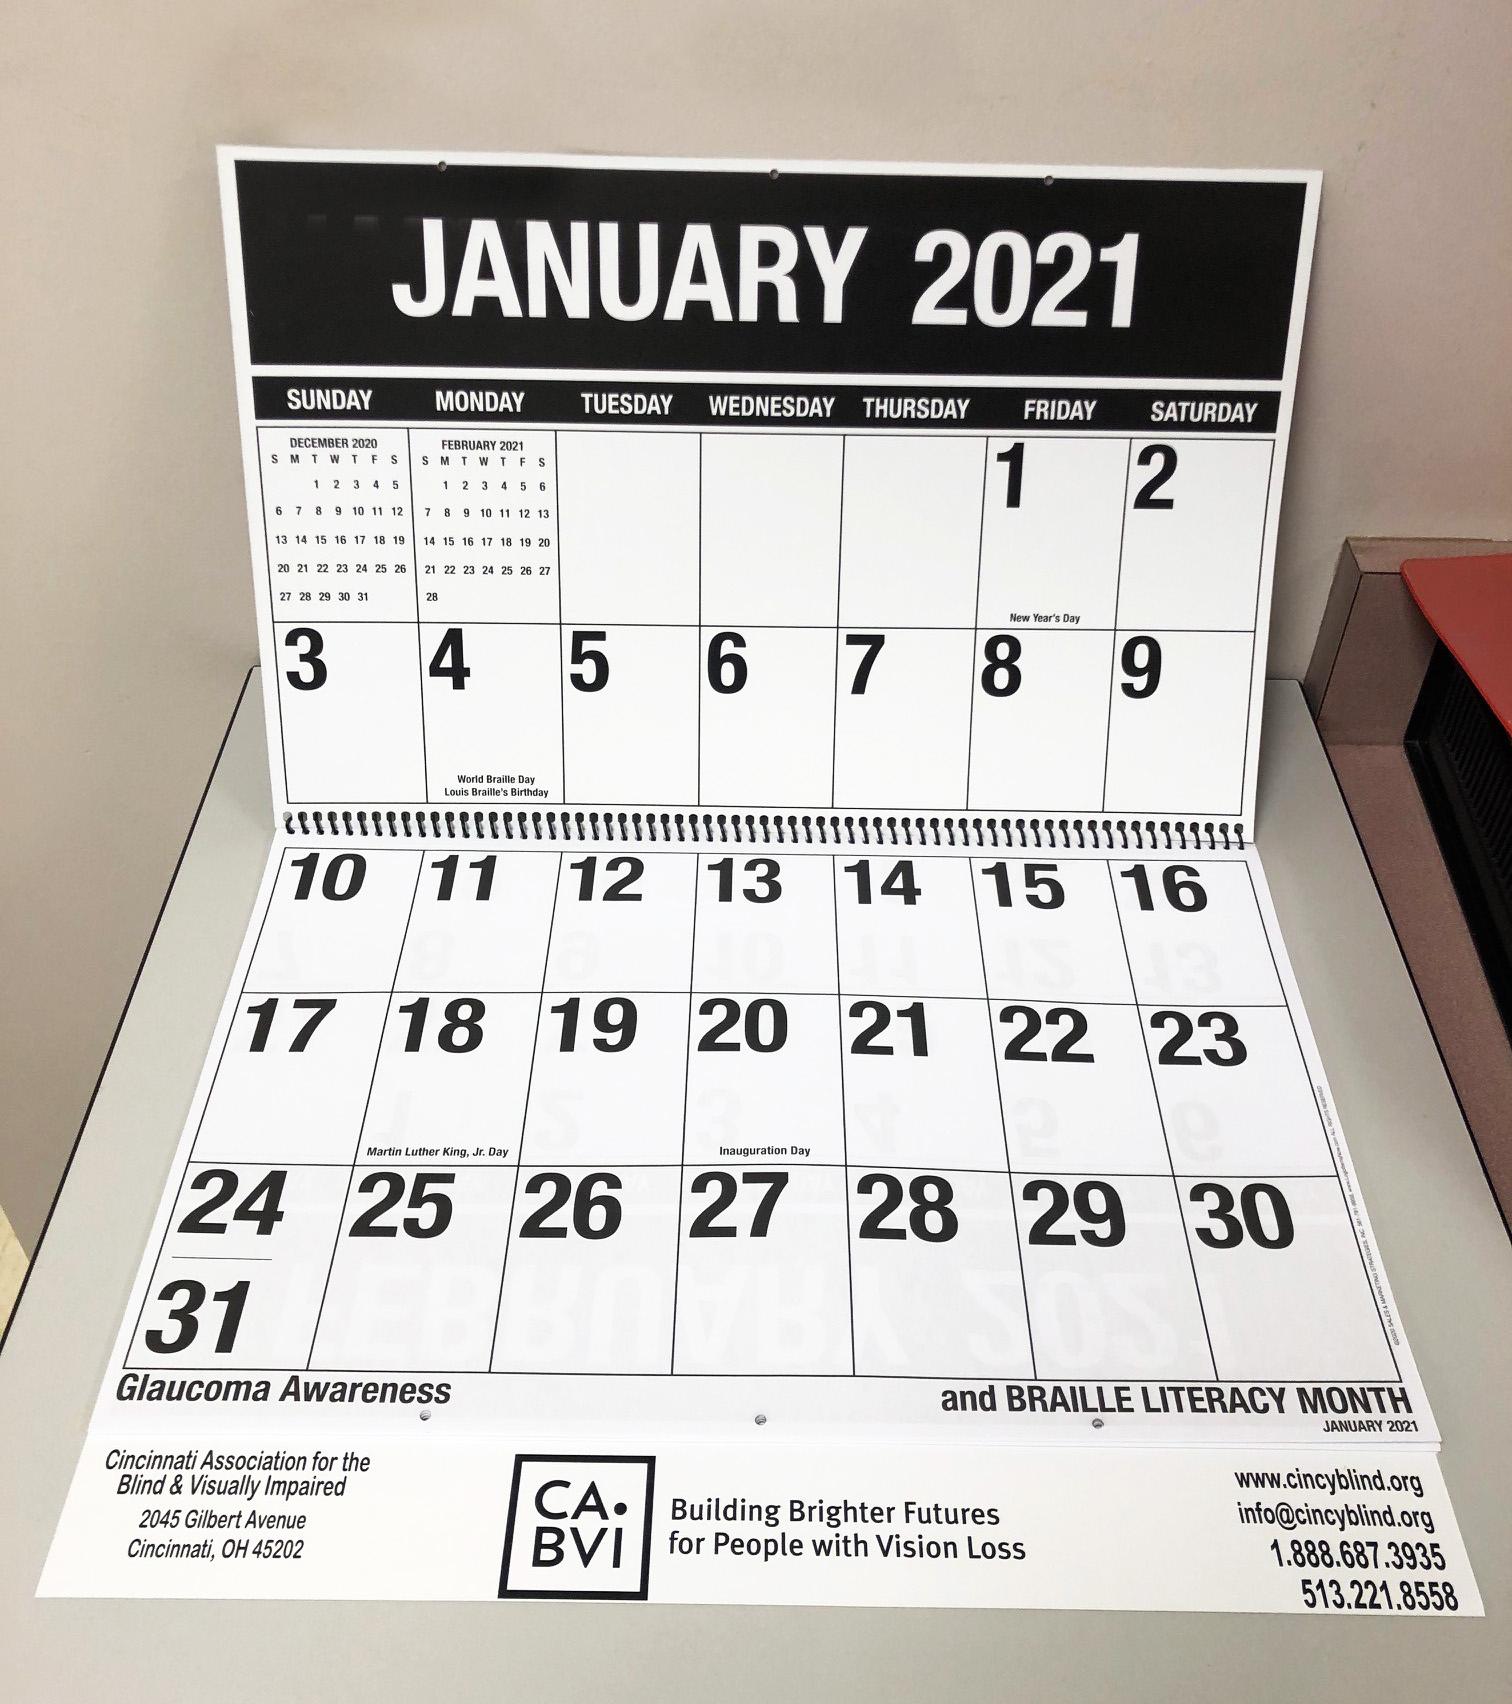 2021 Large Print Calendar in 2021 Large Print Calendar Monthly